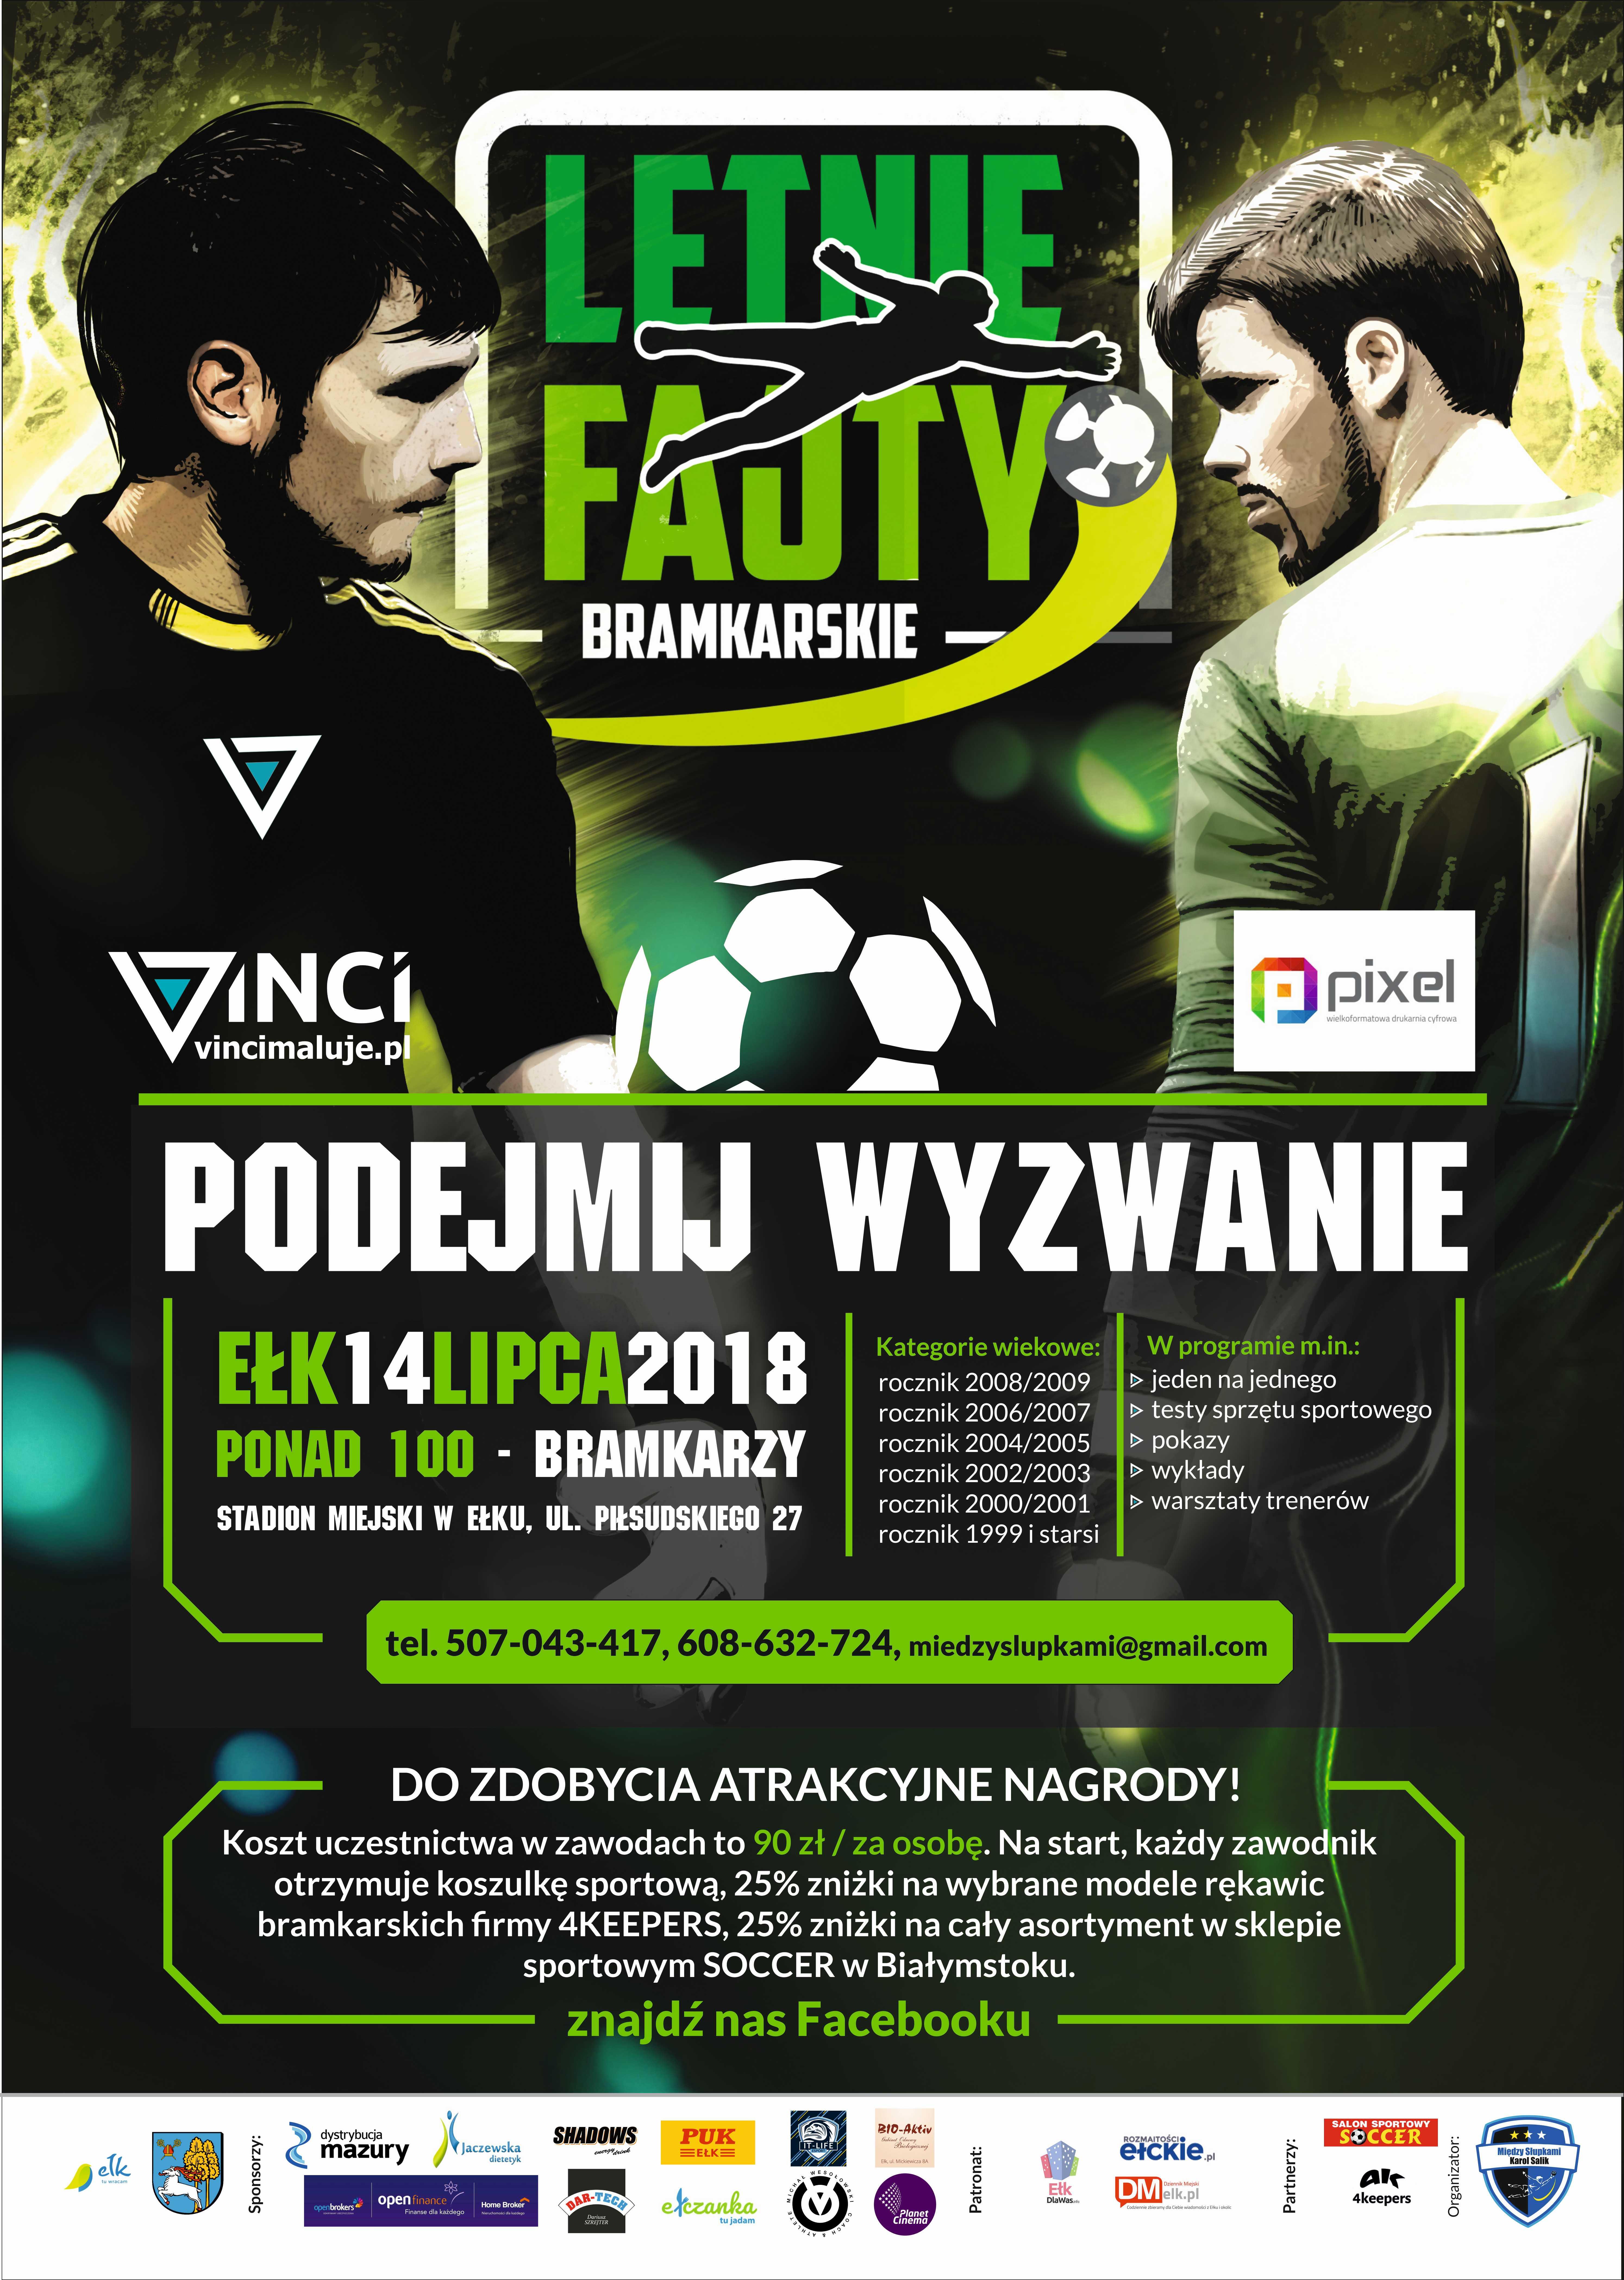 http://m.wm.pl/2018/07/orig/plakat-fajty-bramkarskie-male-477454.jpg